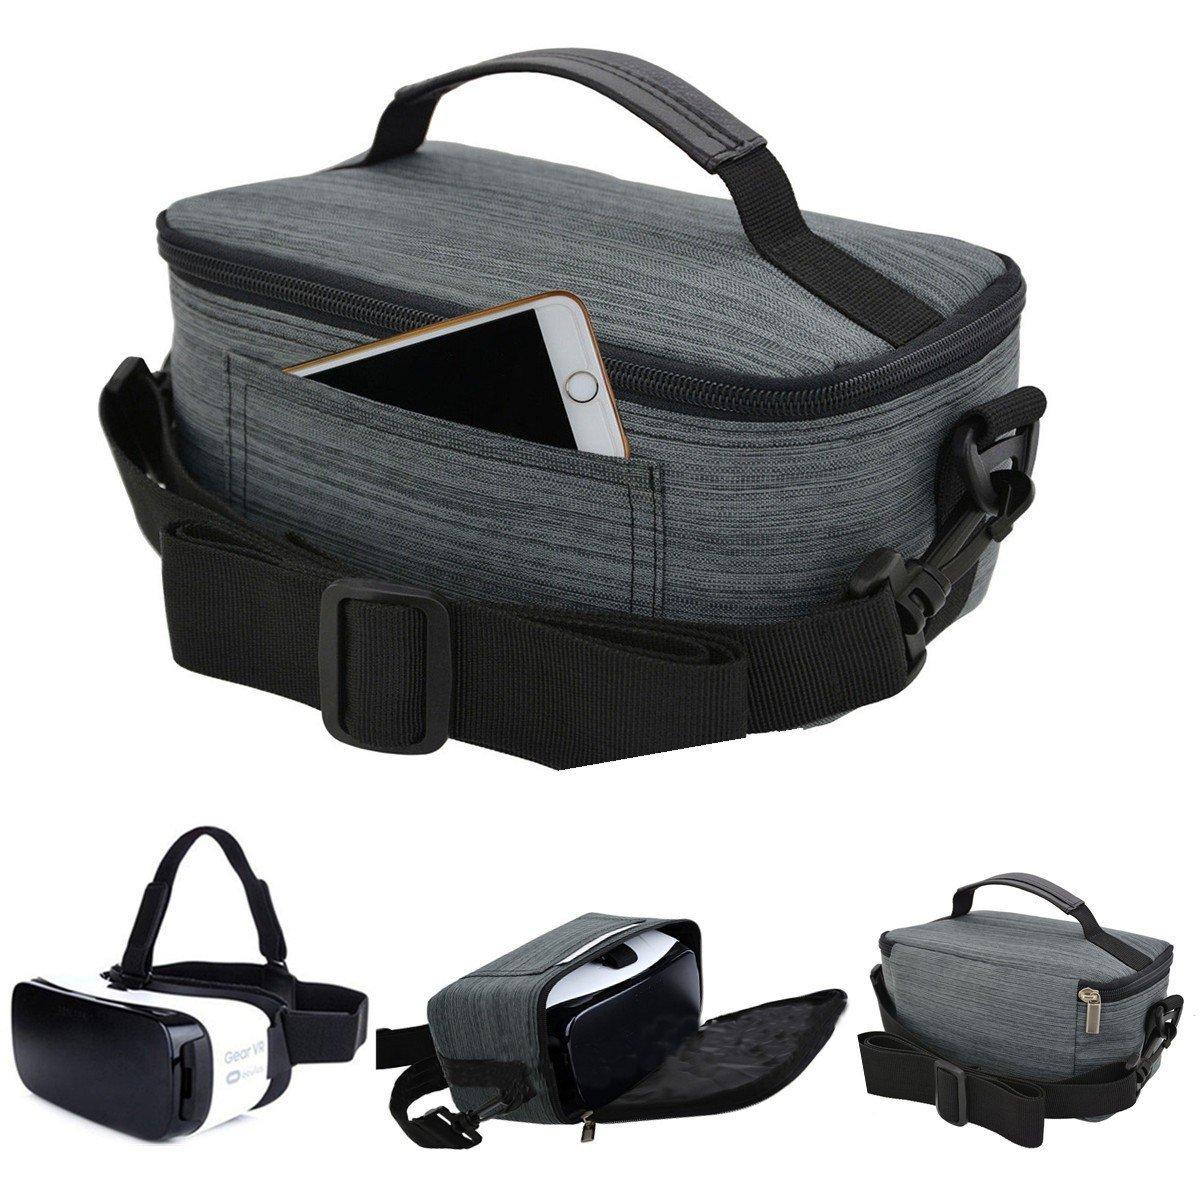 BephaMart Nylon 3D Glasses Cover Bag Storage Carrying Case For Samsung Gear VR Oculus 3D Glasses